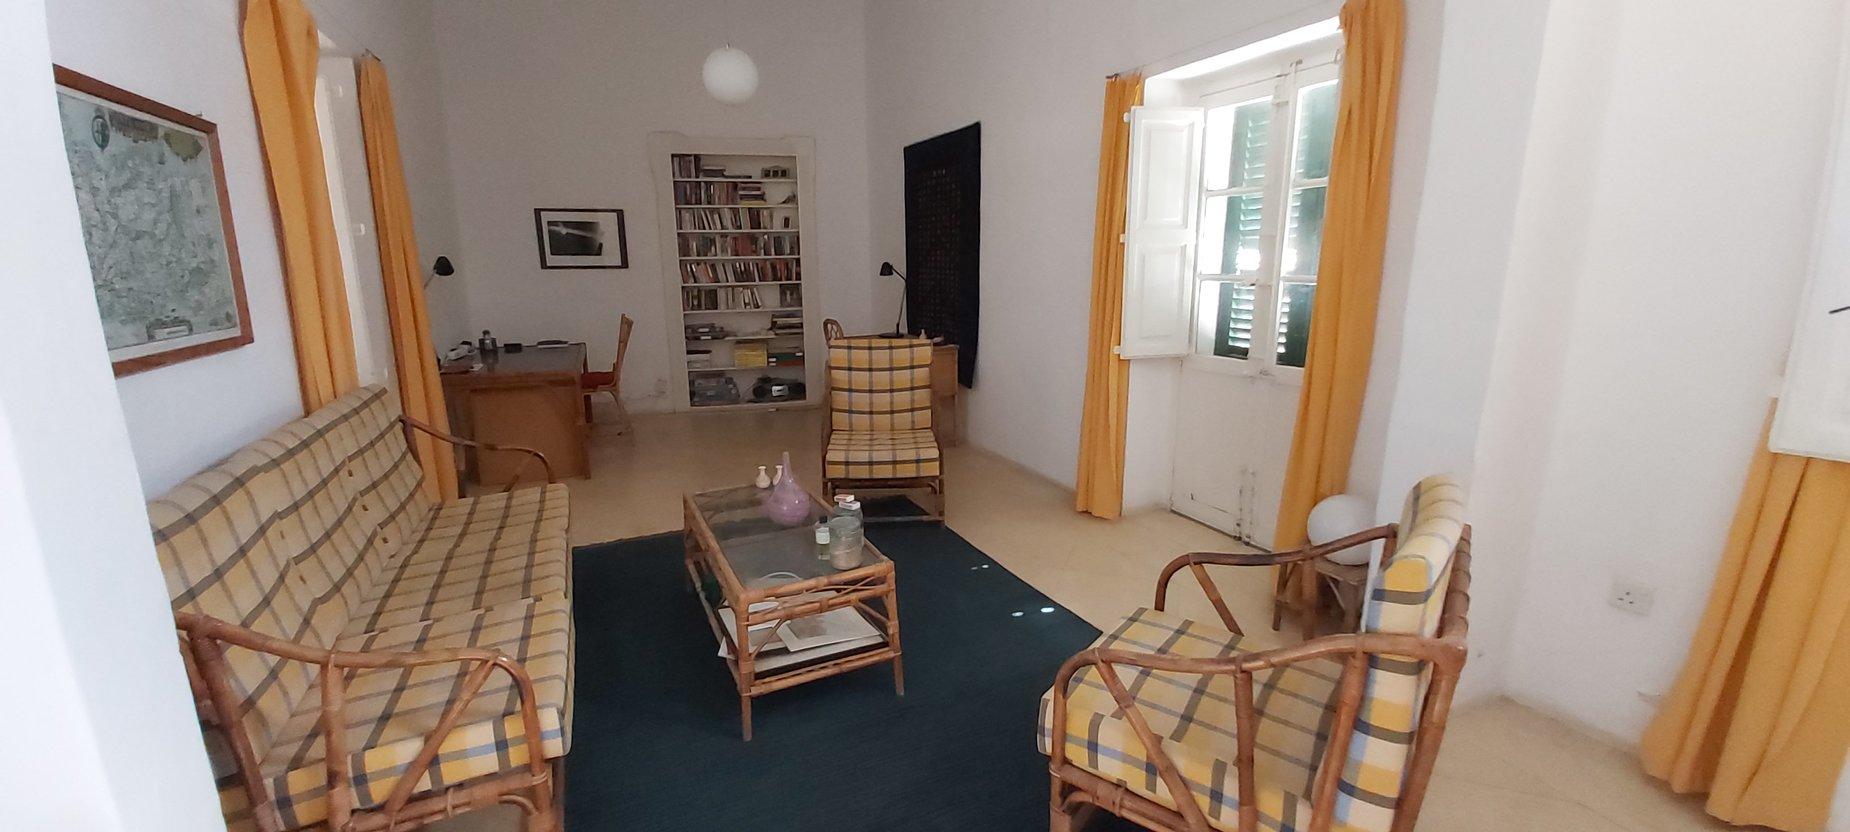 5 bed Town House For Sale in Lija, Lija - thumb 15